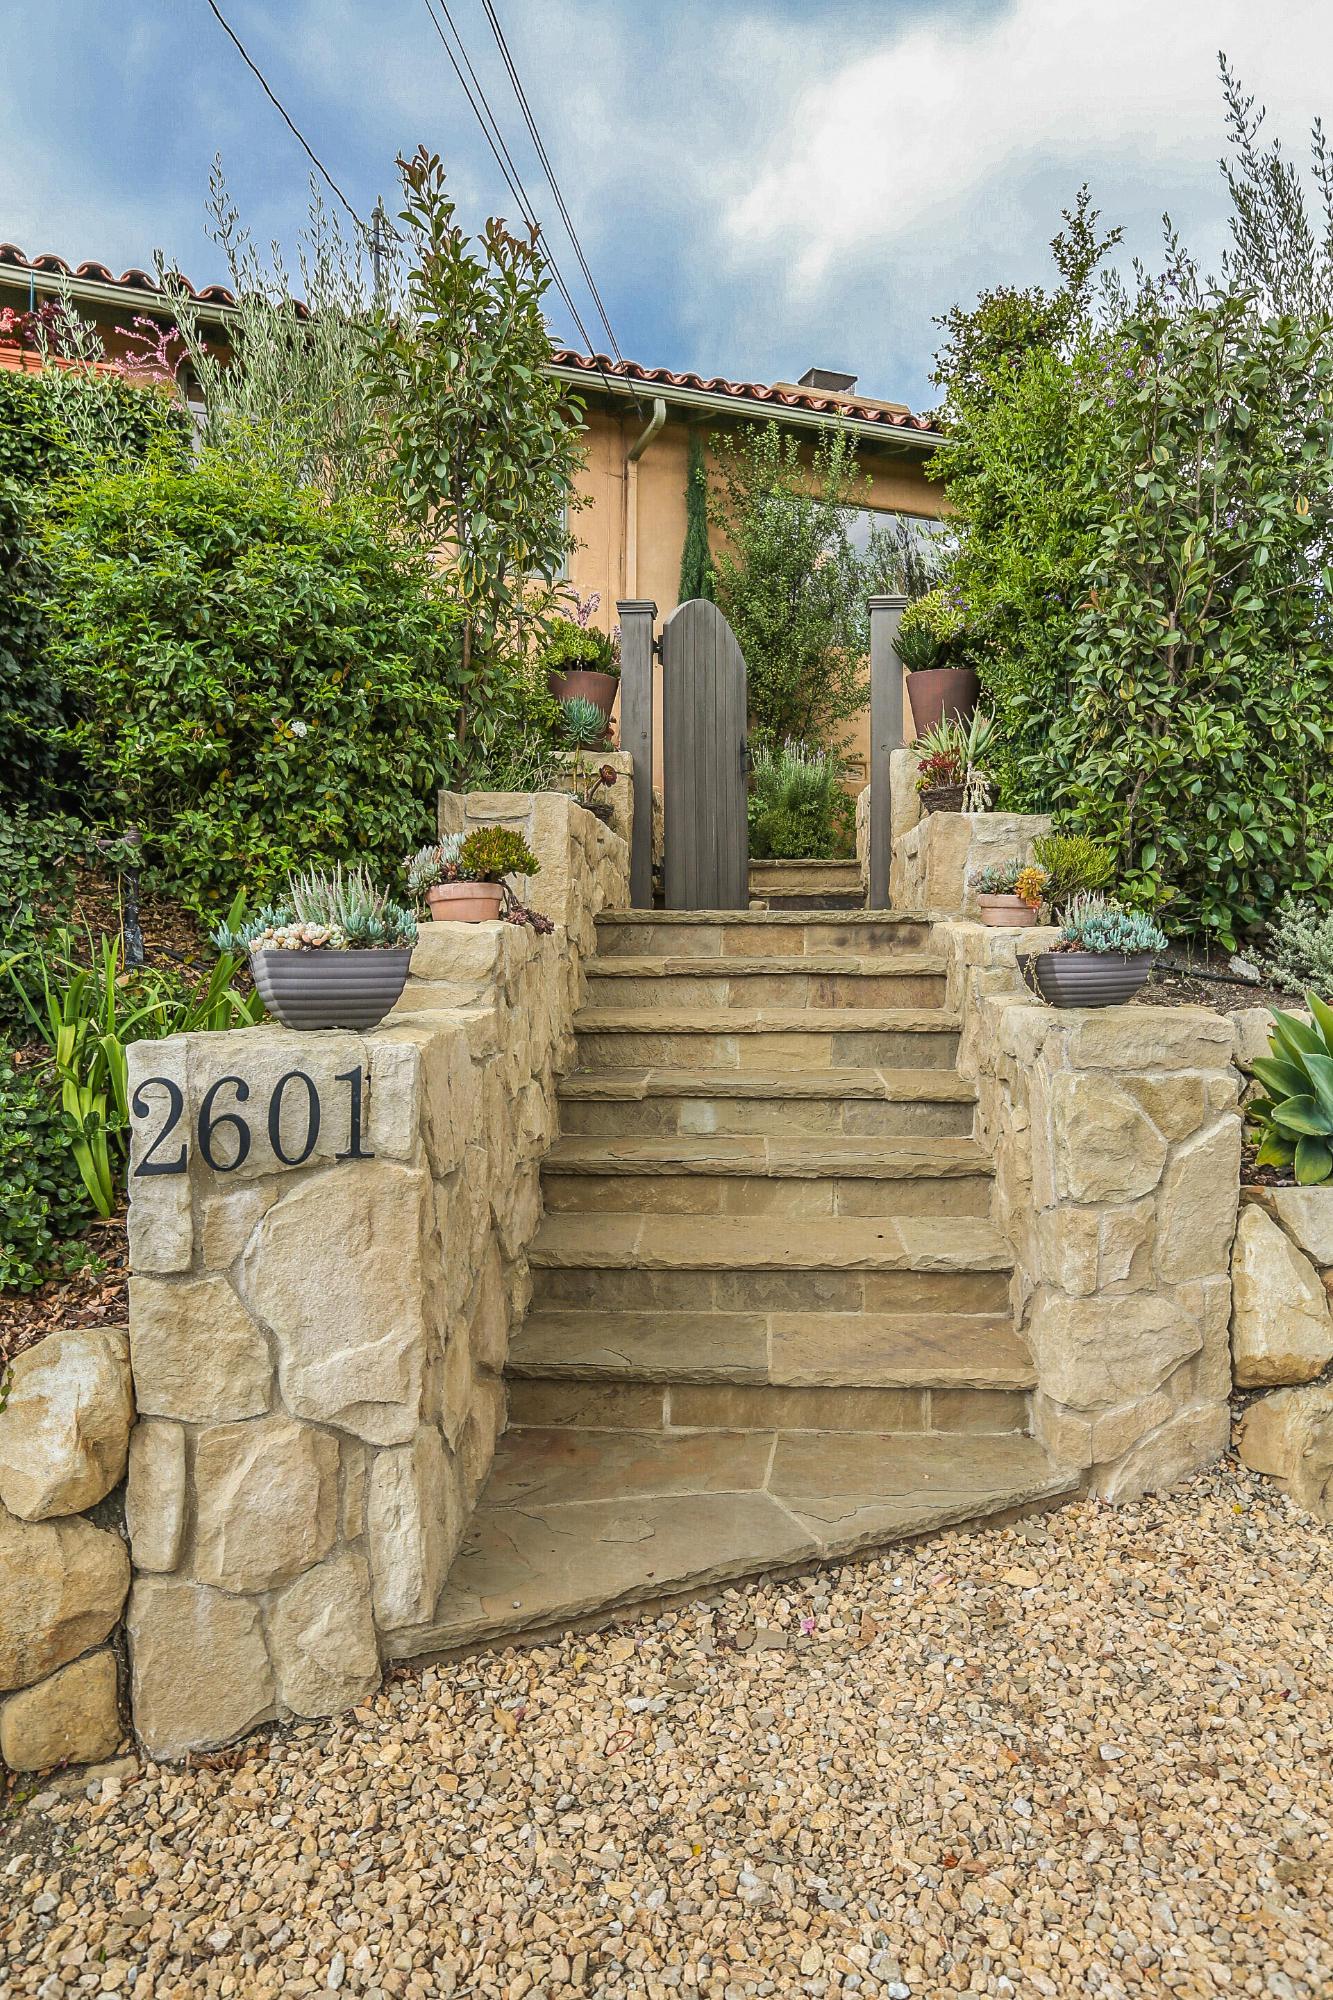 Property photo for 2601 Montrose Pl Santa Barbara, California 93105 - 13-3247